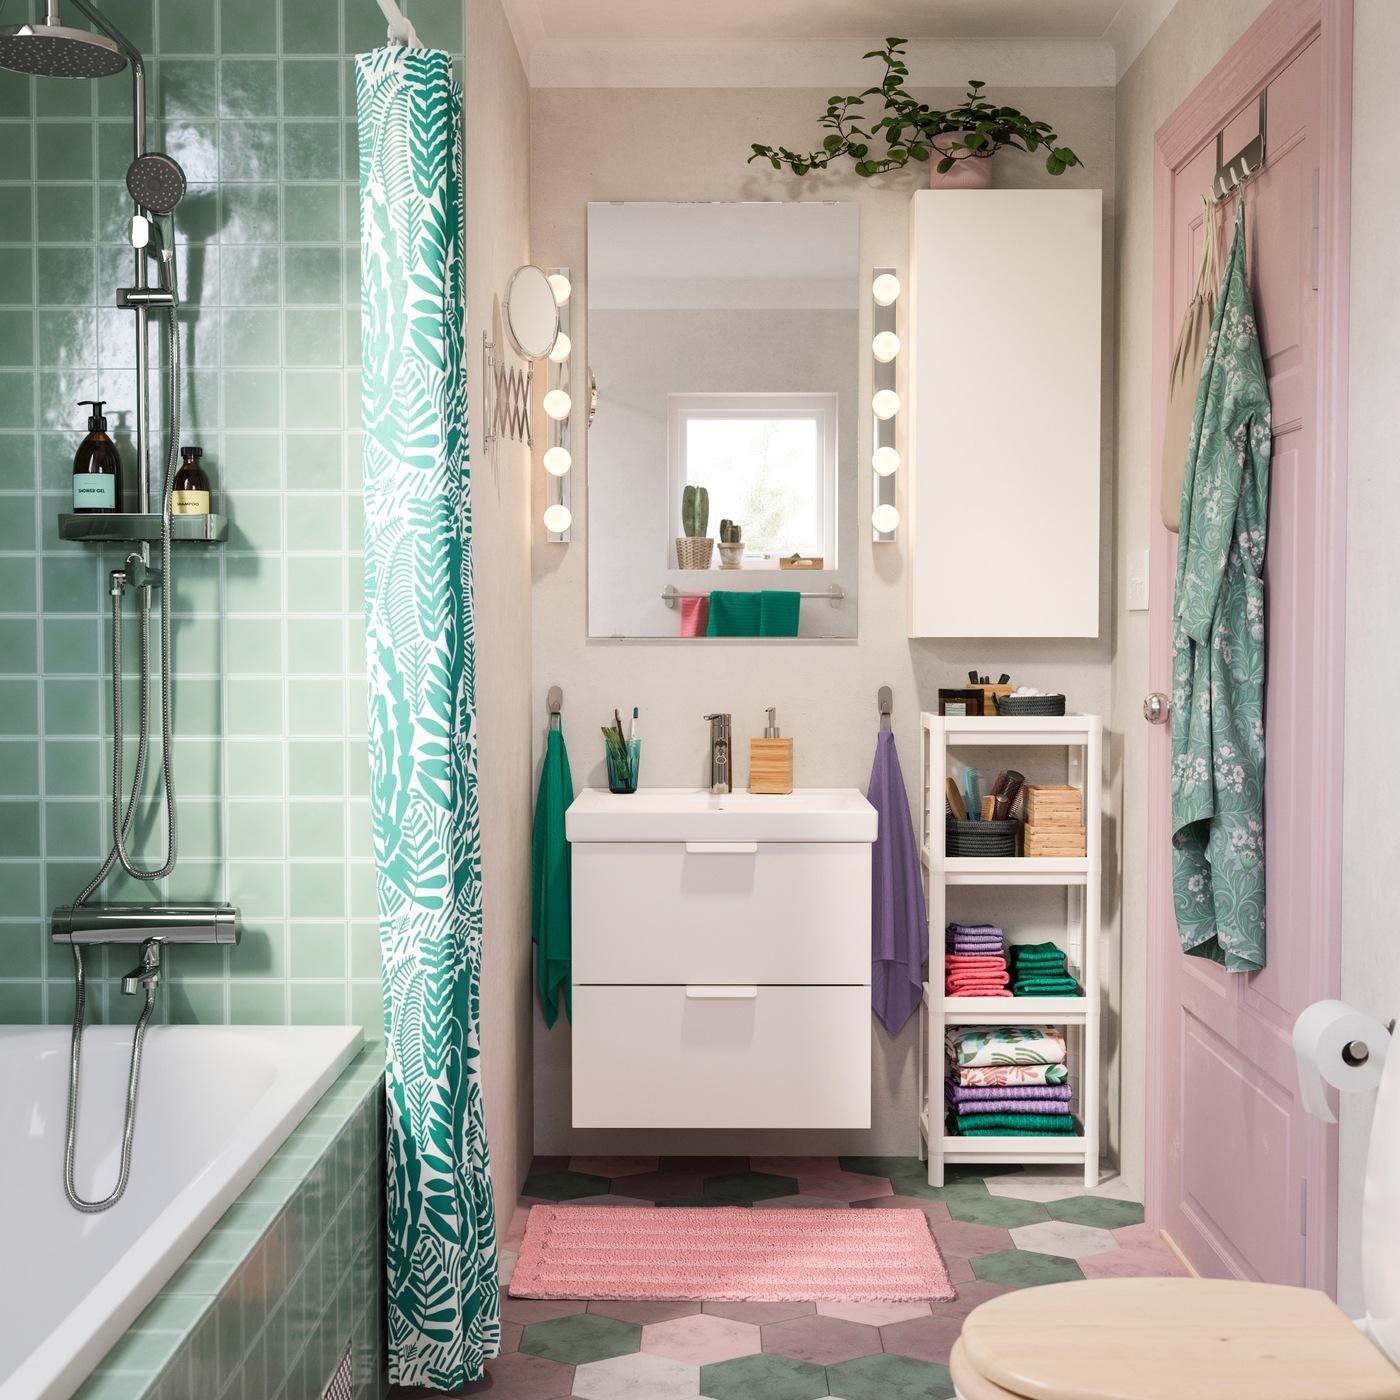 Sebuah kamar mandi yang terang dan penuh gelembung